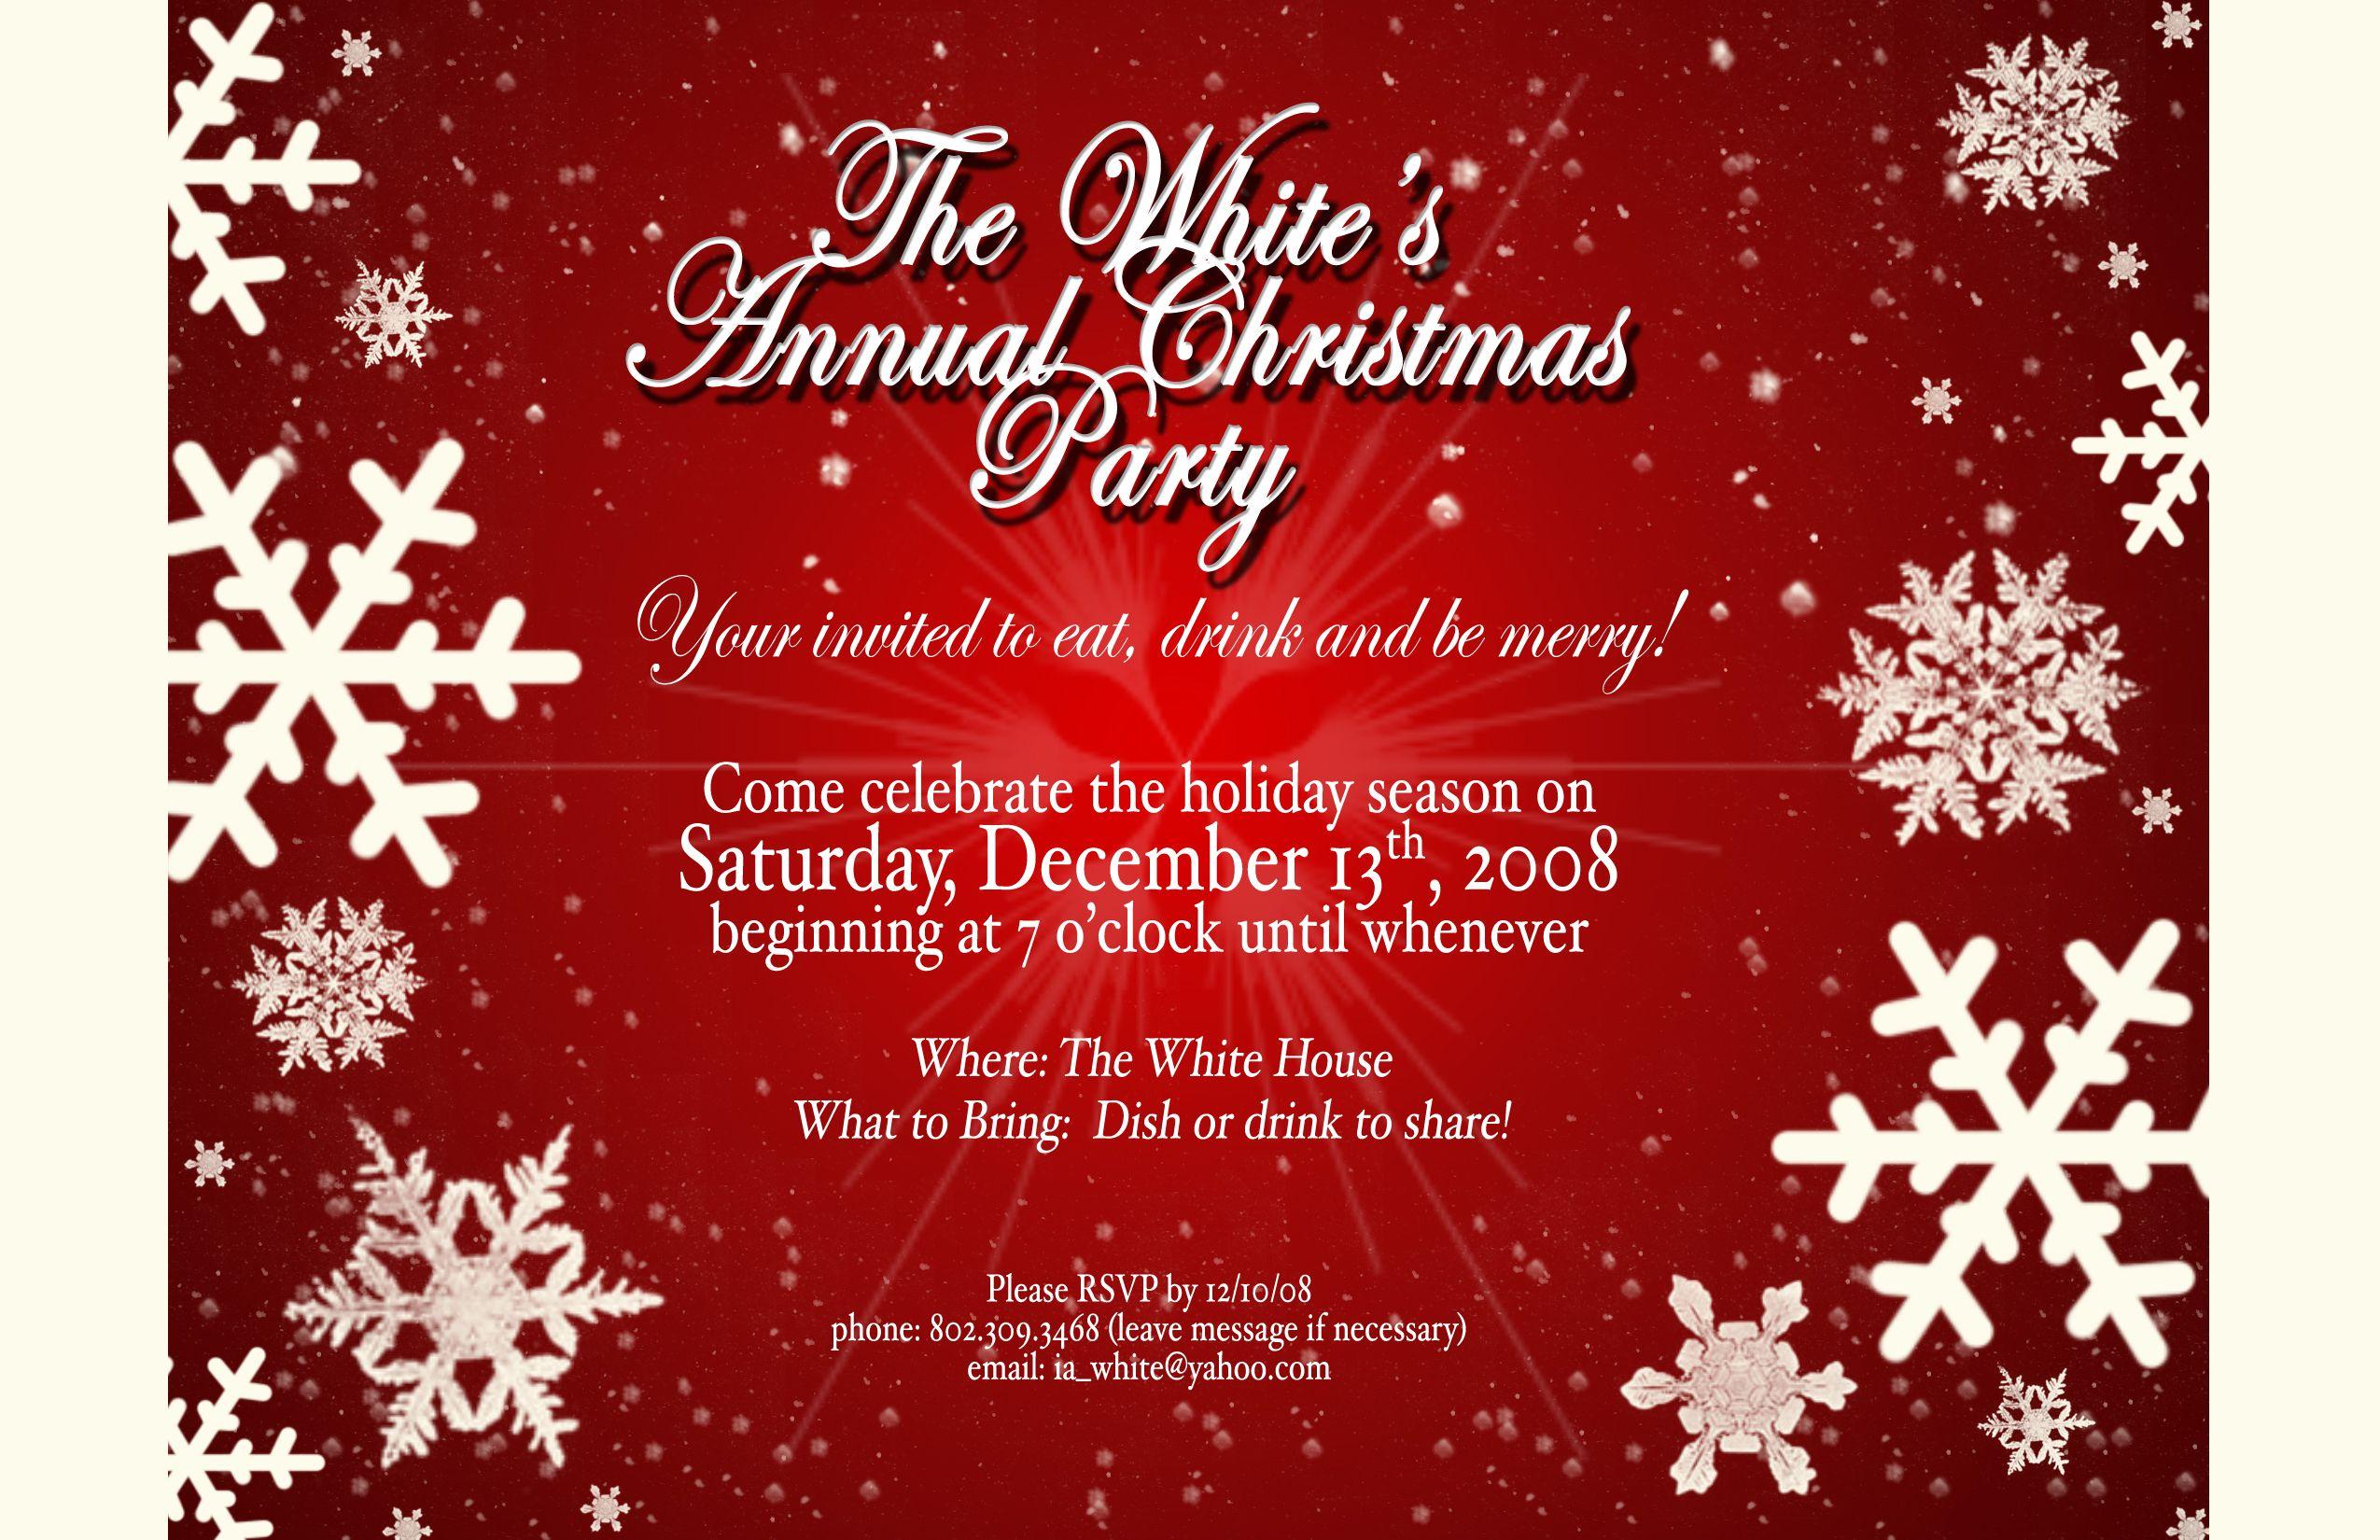 Holiday Party Invitation Holiday Party Invitation Template